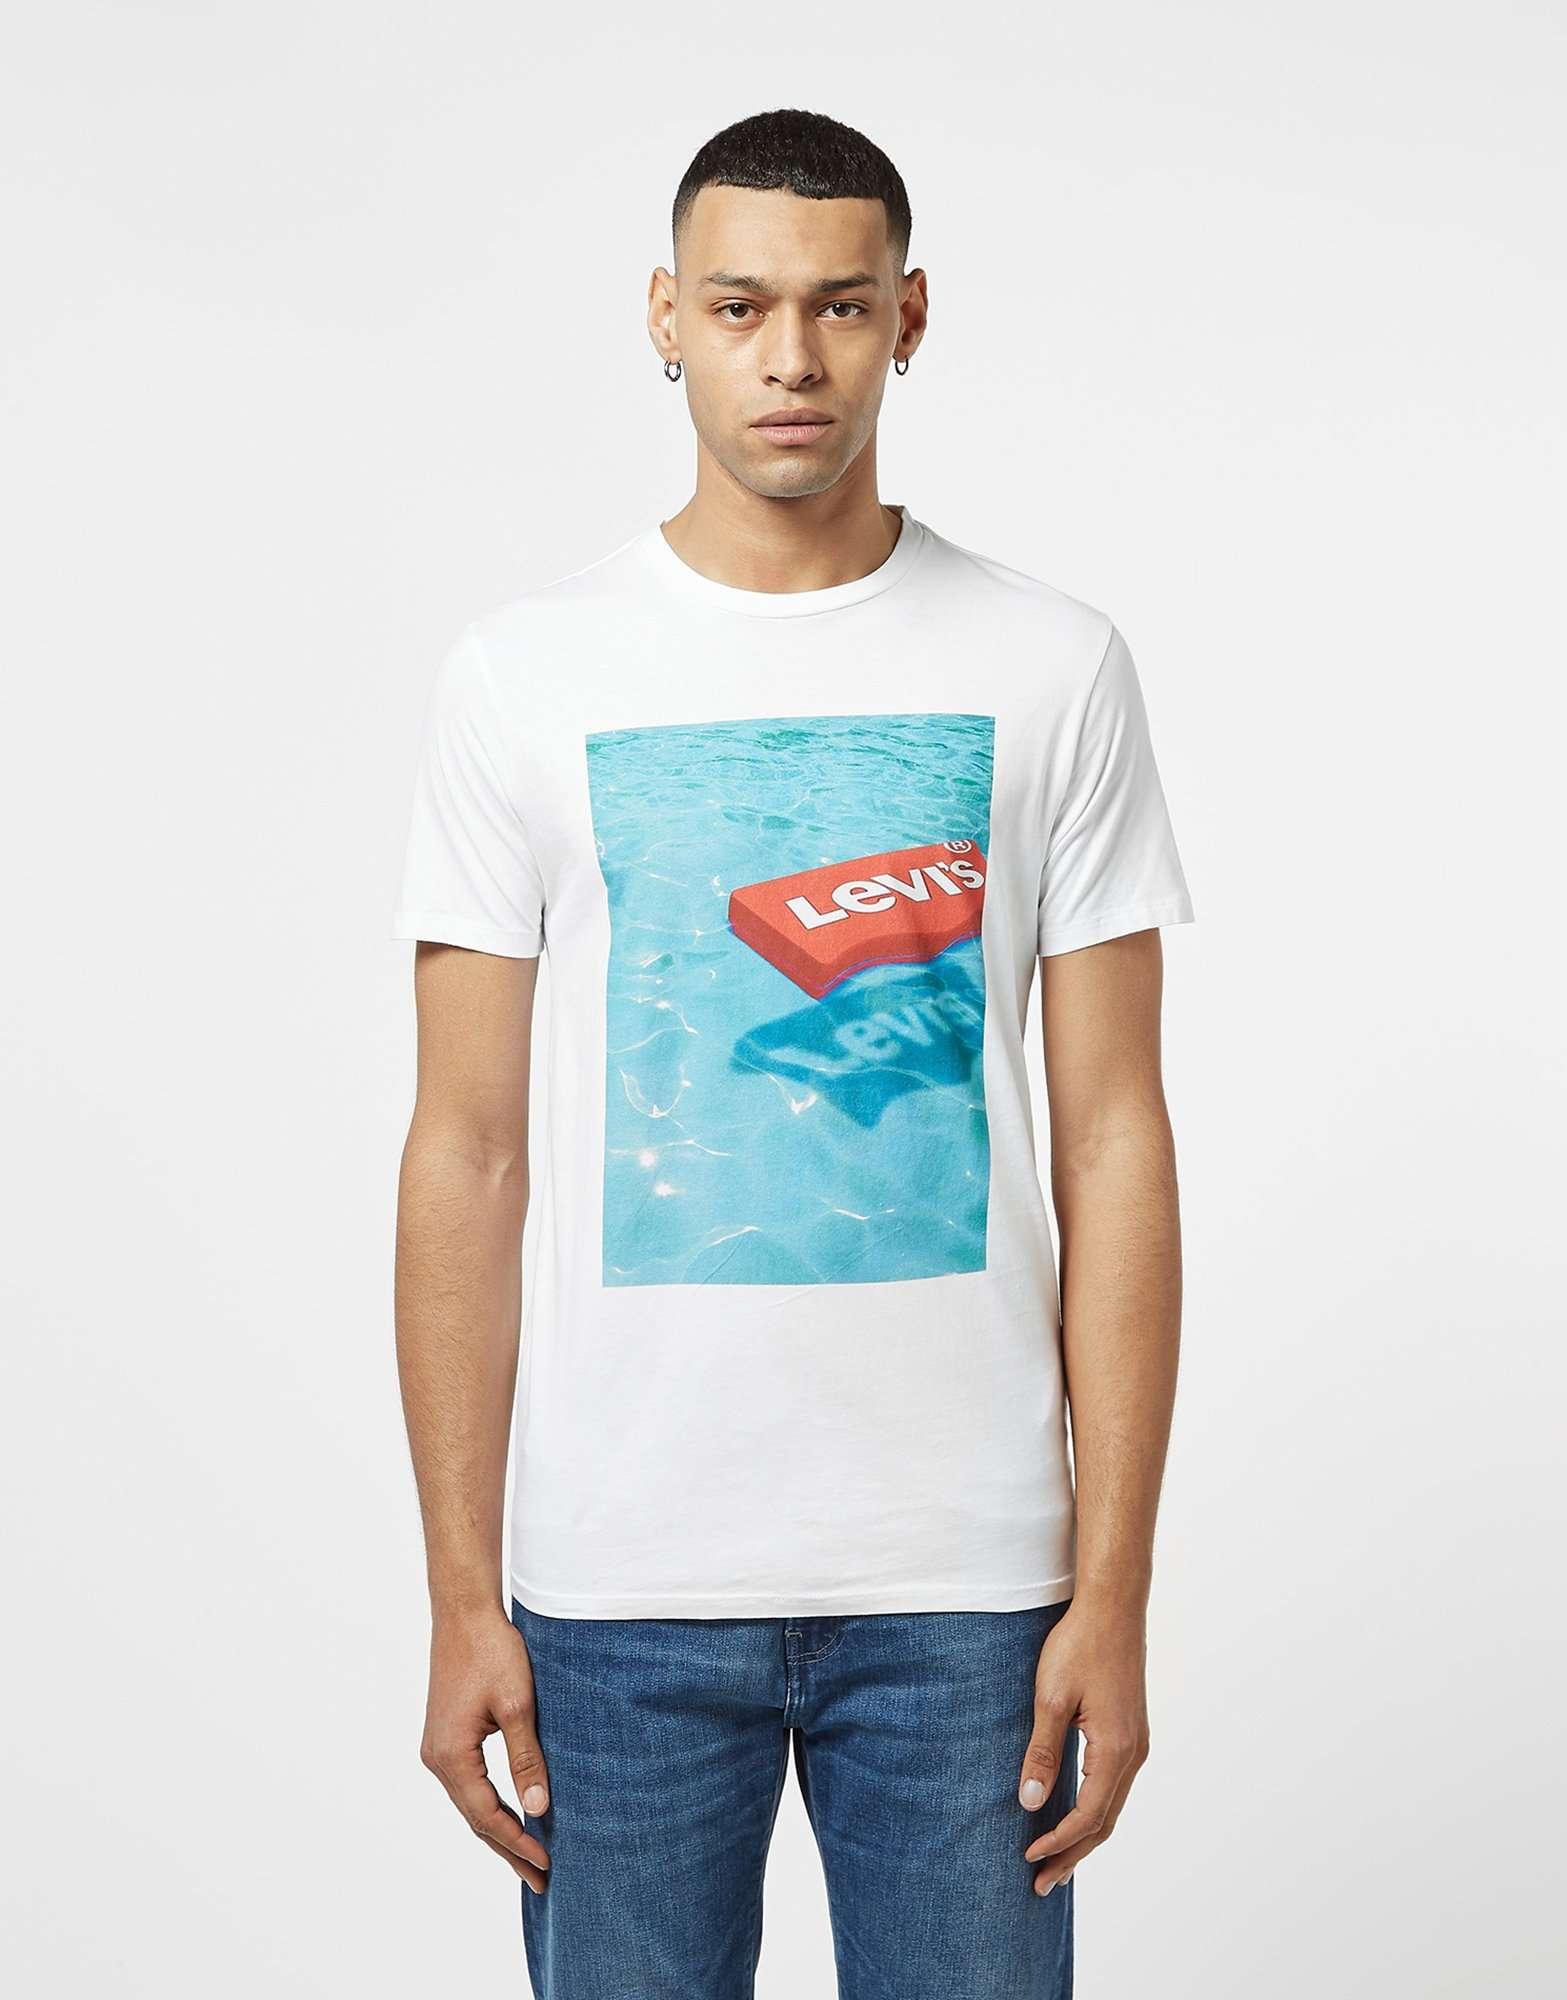 Levis Pool Logo Short Sleeve T-Shirt